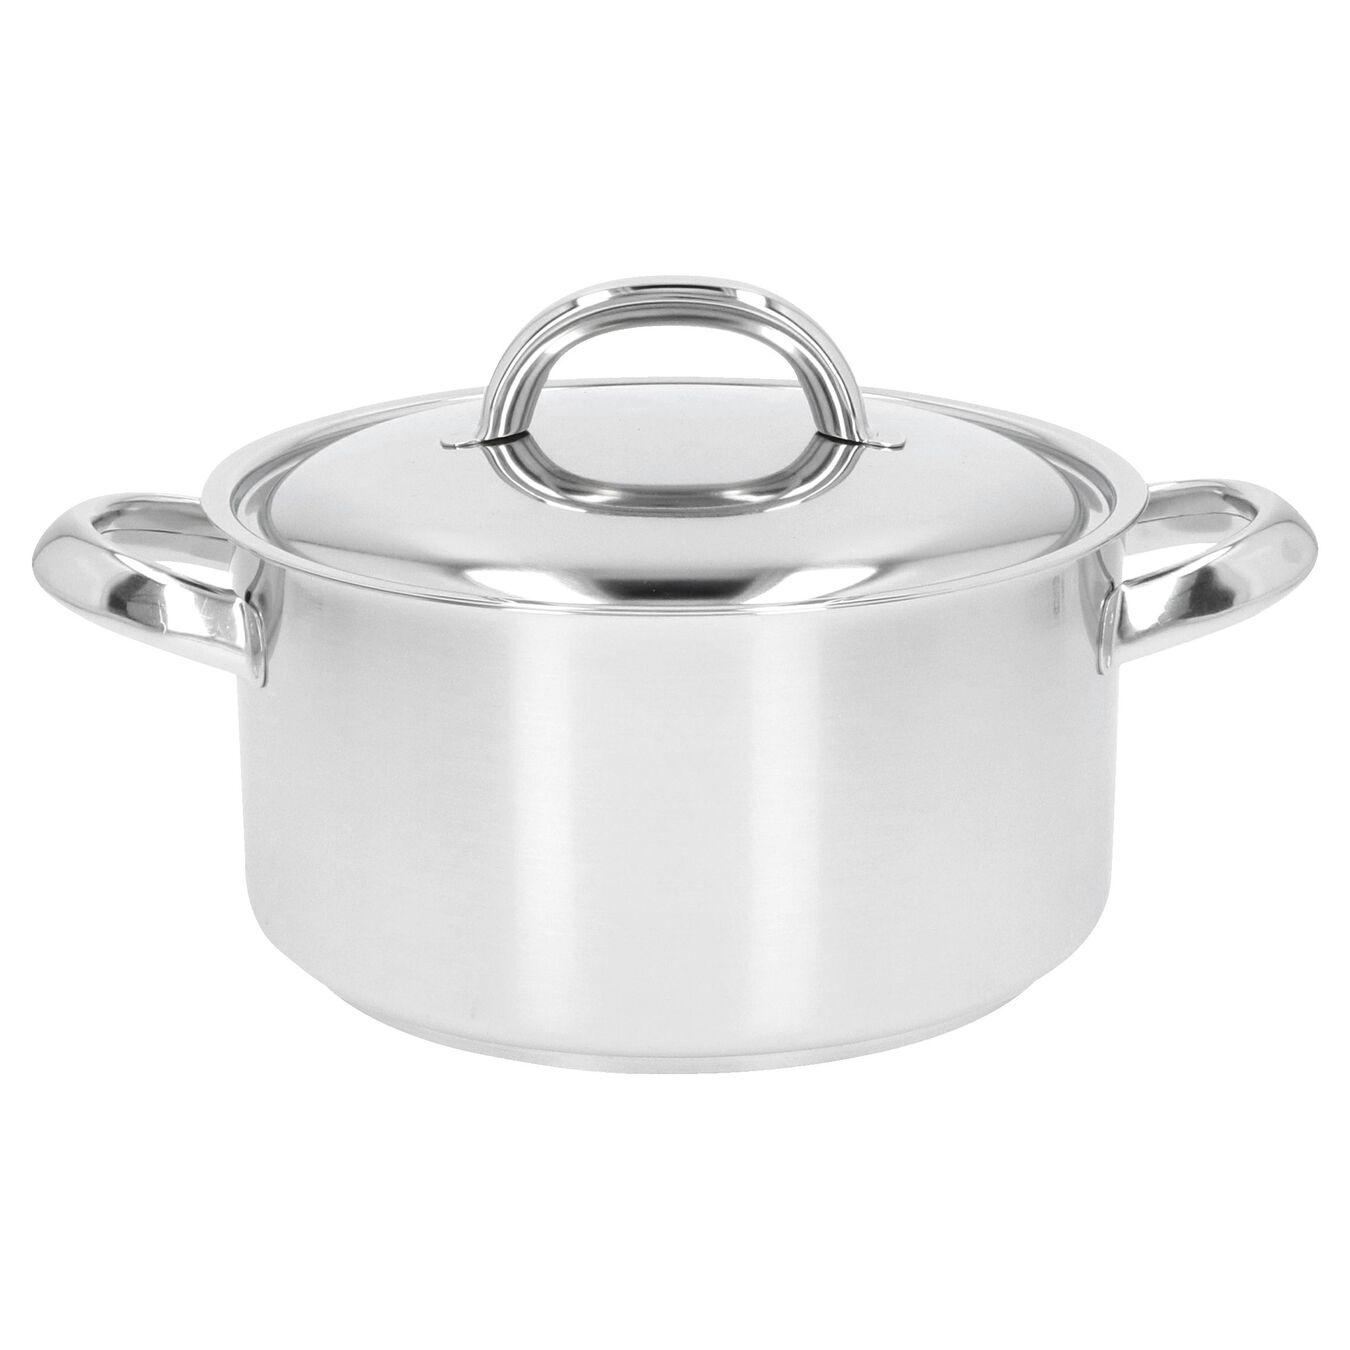 Kookpot met deksel 18 cm / 2,2 l,,large 1